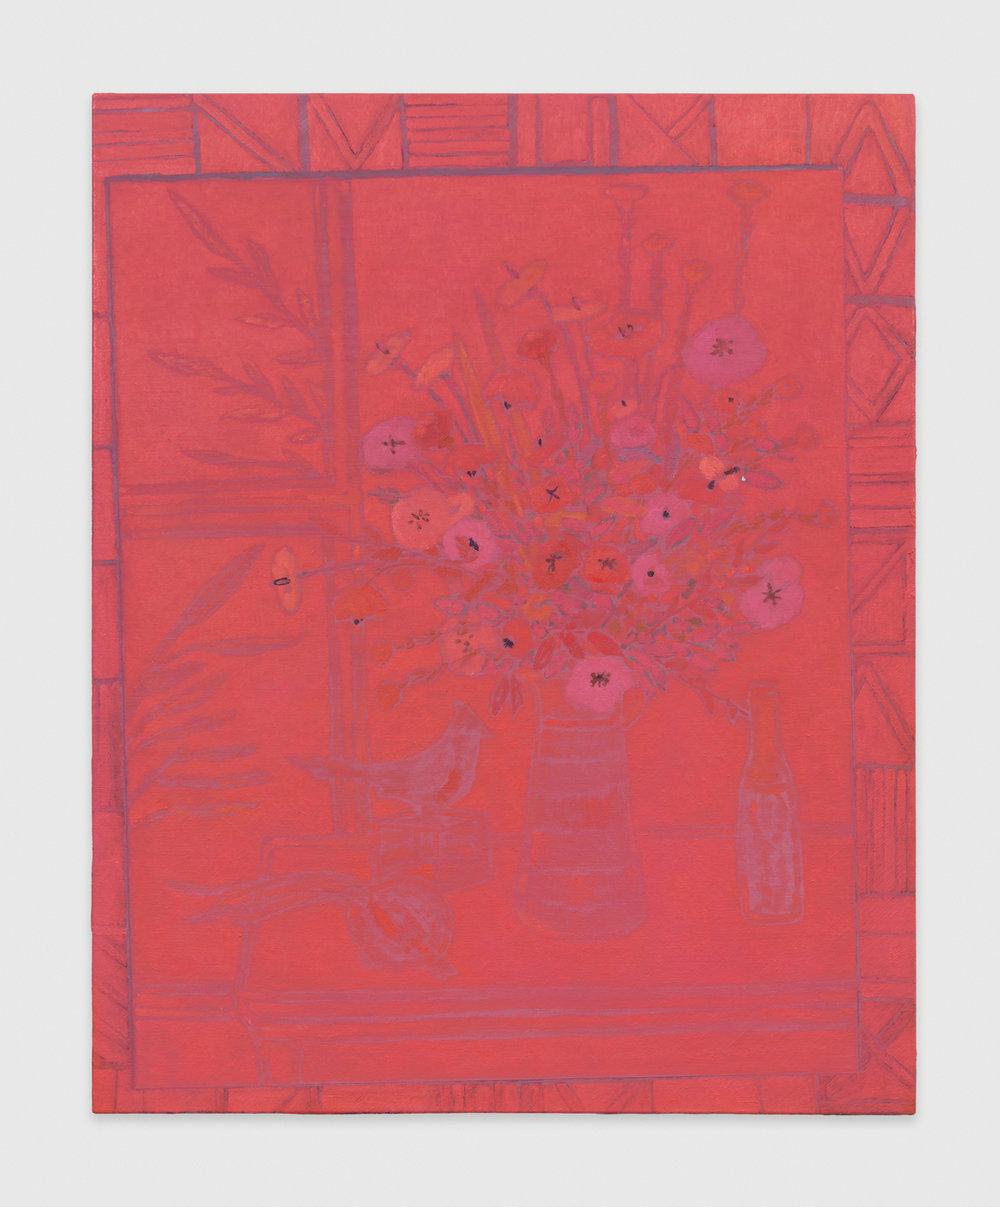 John McAllister  might mingle lusterlike  2014 Oil on canvas 31h x 25w in JMC013